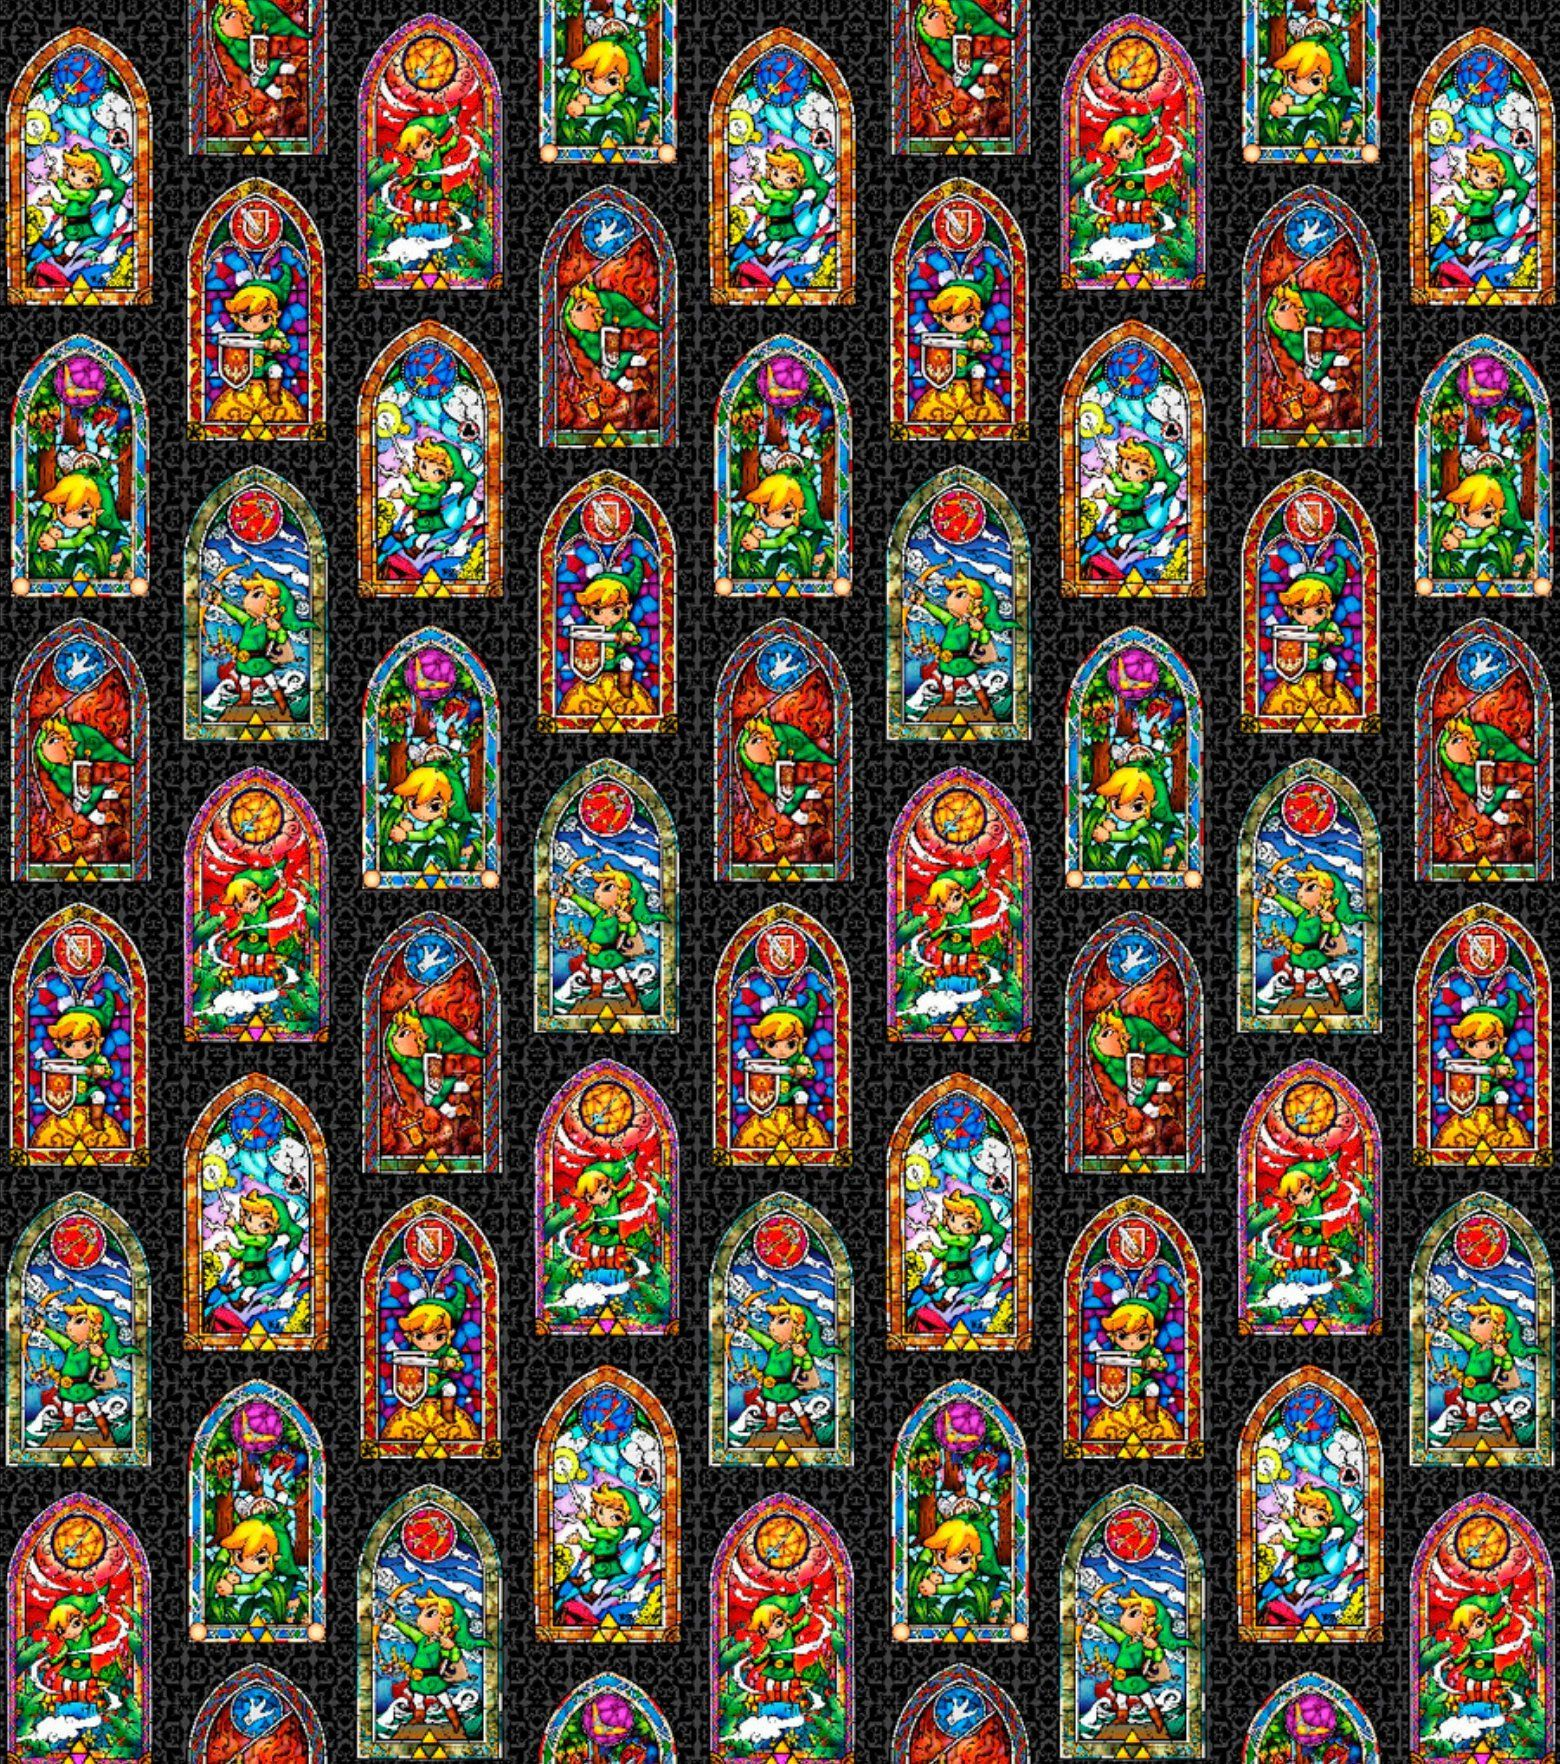 1 YARD PIECE ALPHABET /& PICTURS FABRIC 100/% COTTON  FABRIC NEW CUTE !!!!